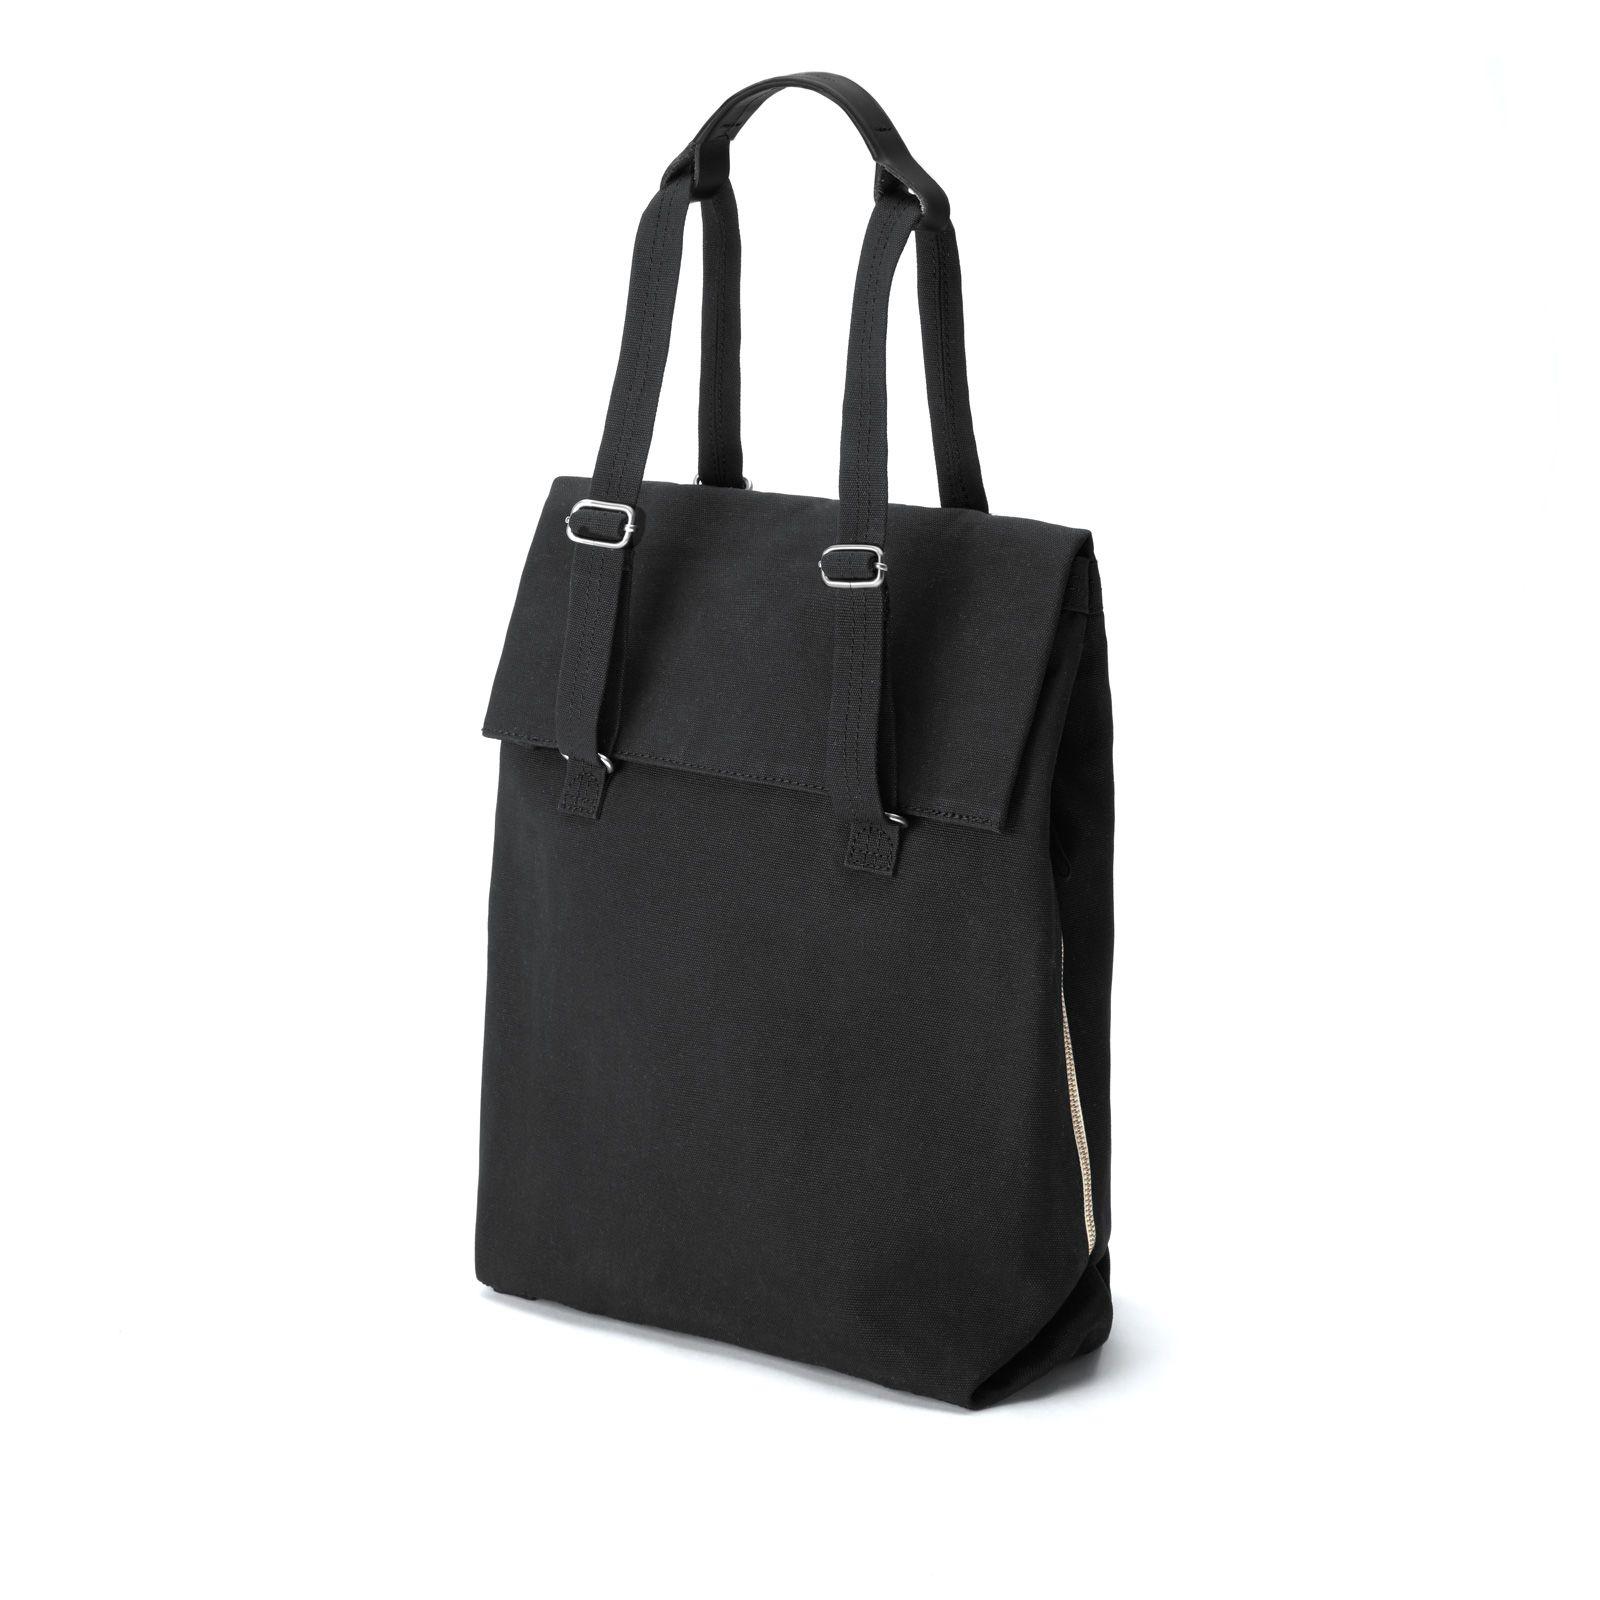 Flap Tote Medium / Bananatex® - All Black